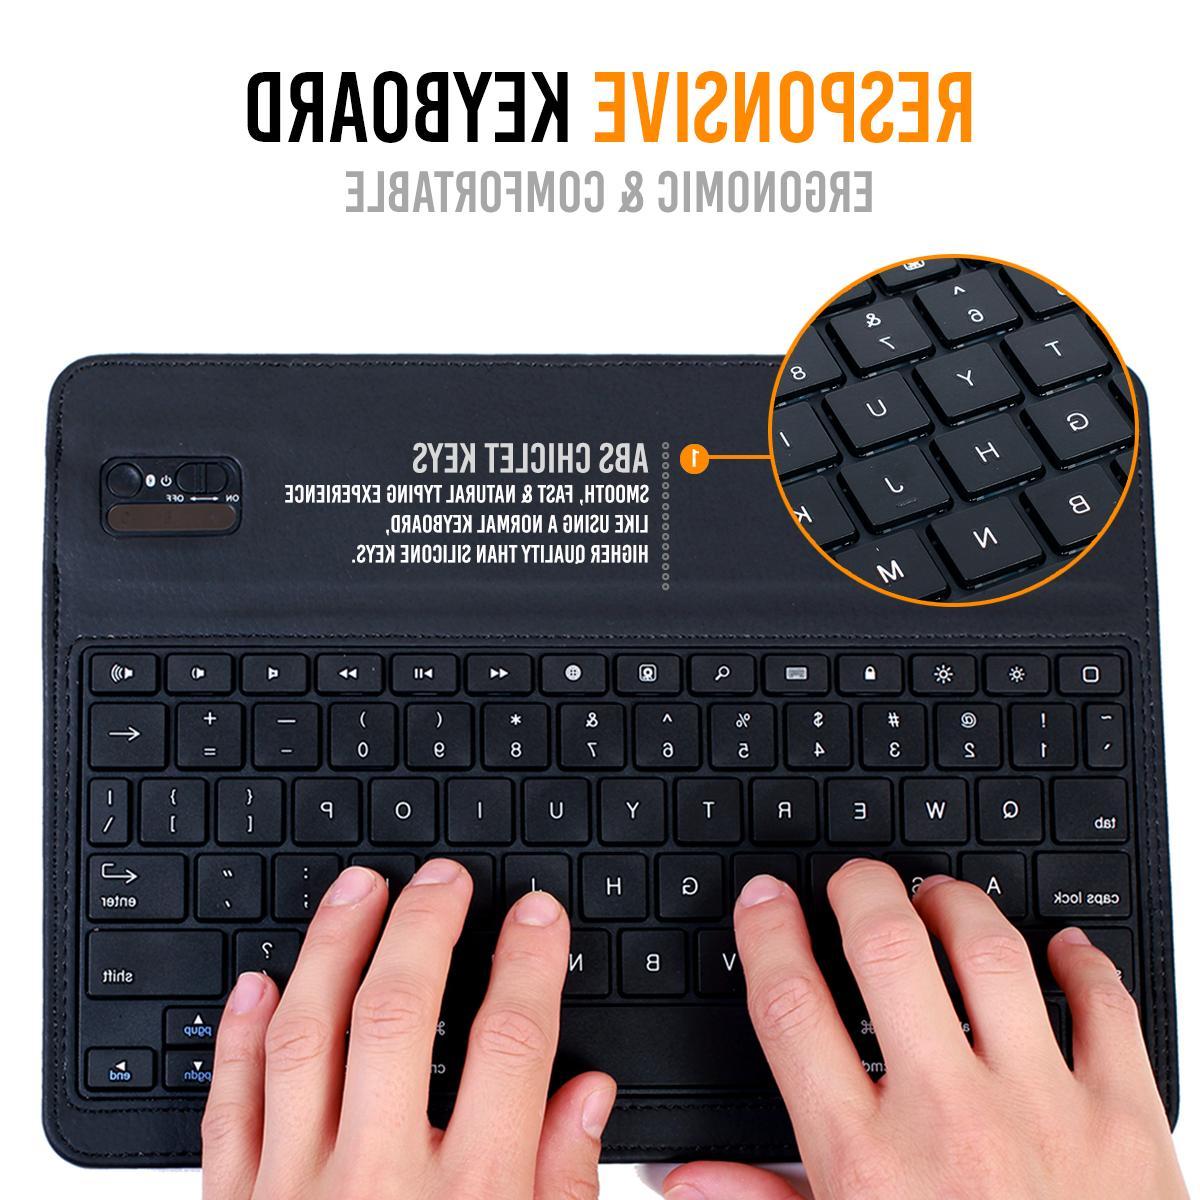 iPad Pro 10.5 Keyboard Detachable Leather Folio